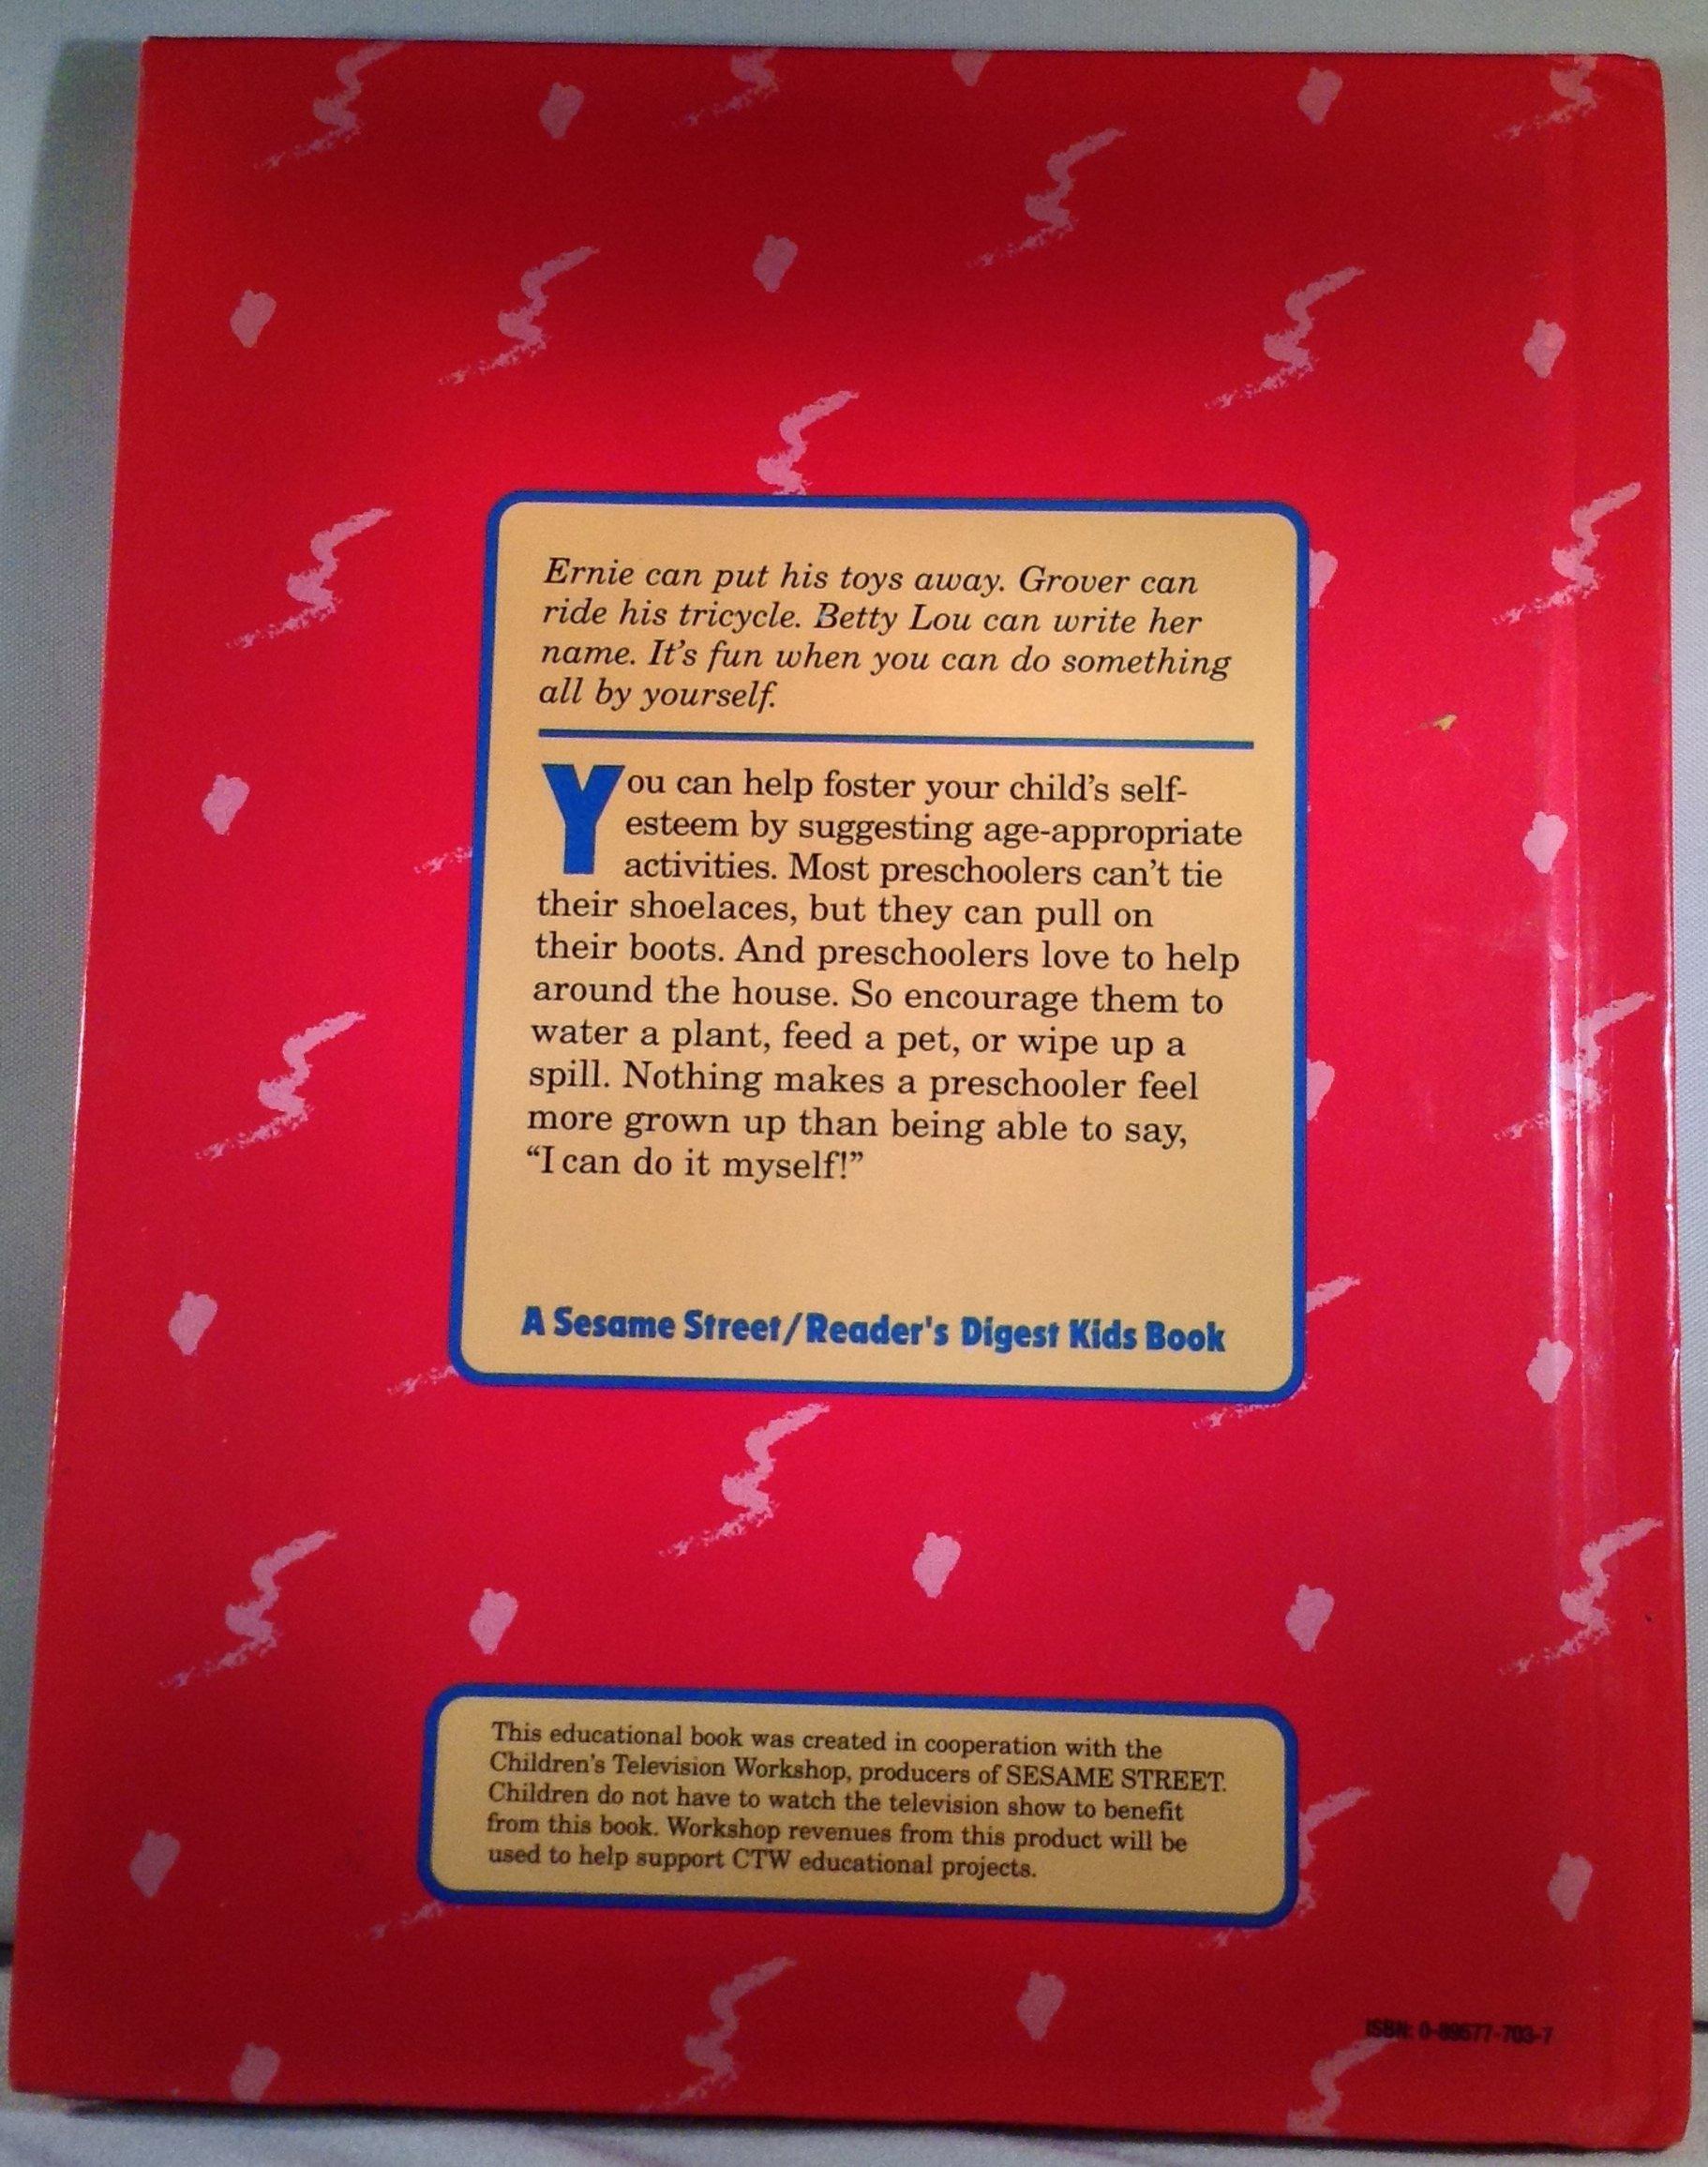 I can do it myself sesame street book club richard brown emily i can do it myself sesame street book club richard brown emily perl kingsley 9780895777034 amazon books solutioingenieria Images